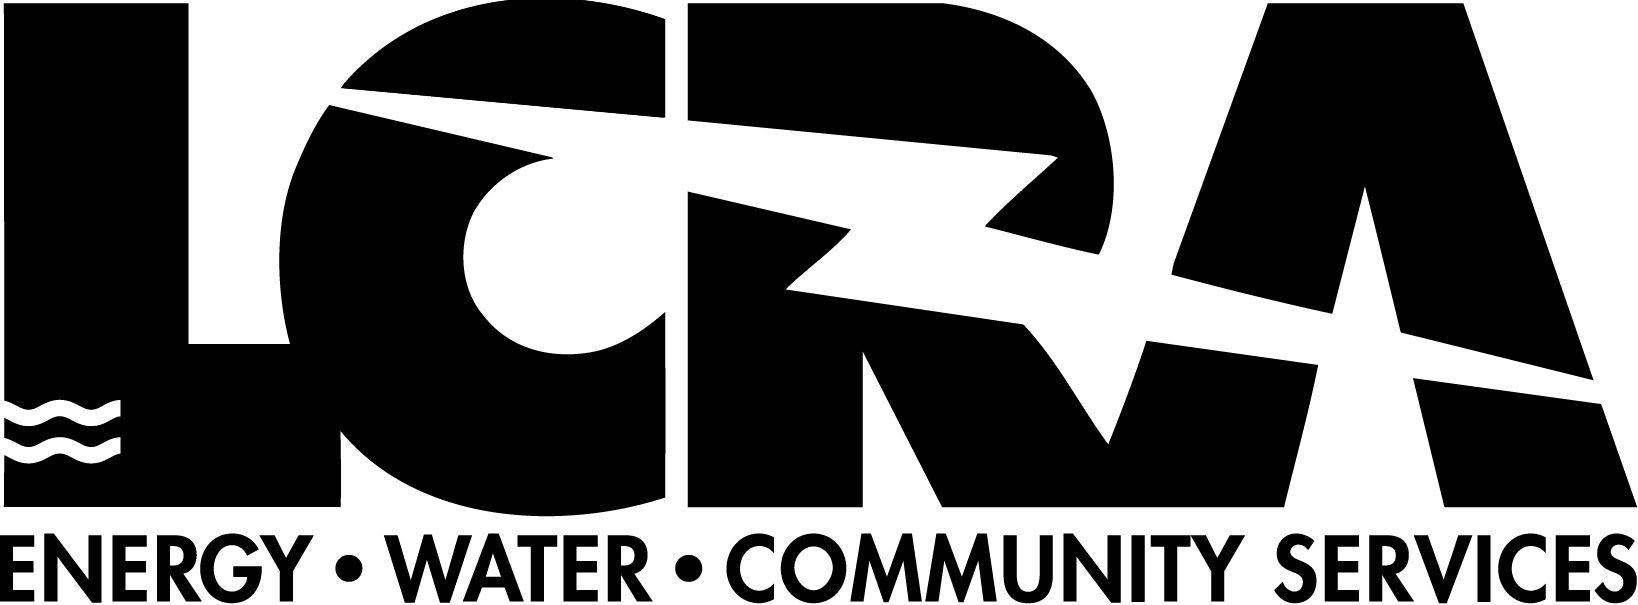 LCRAnew-logo-black.jpg